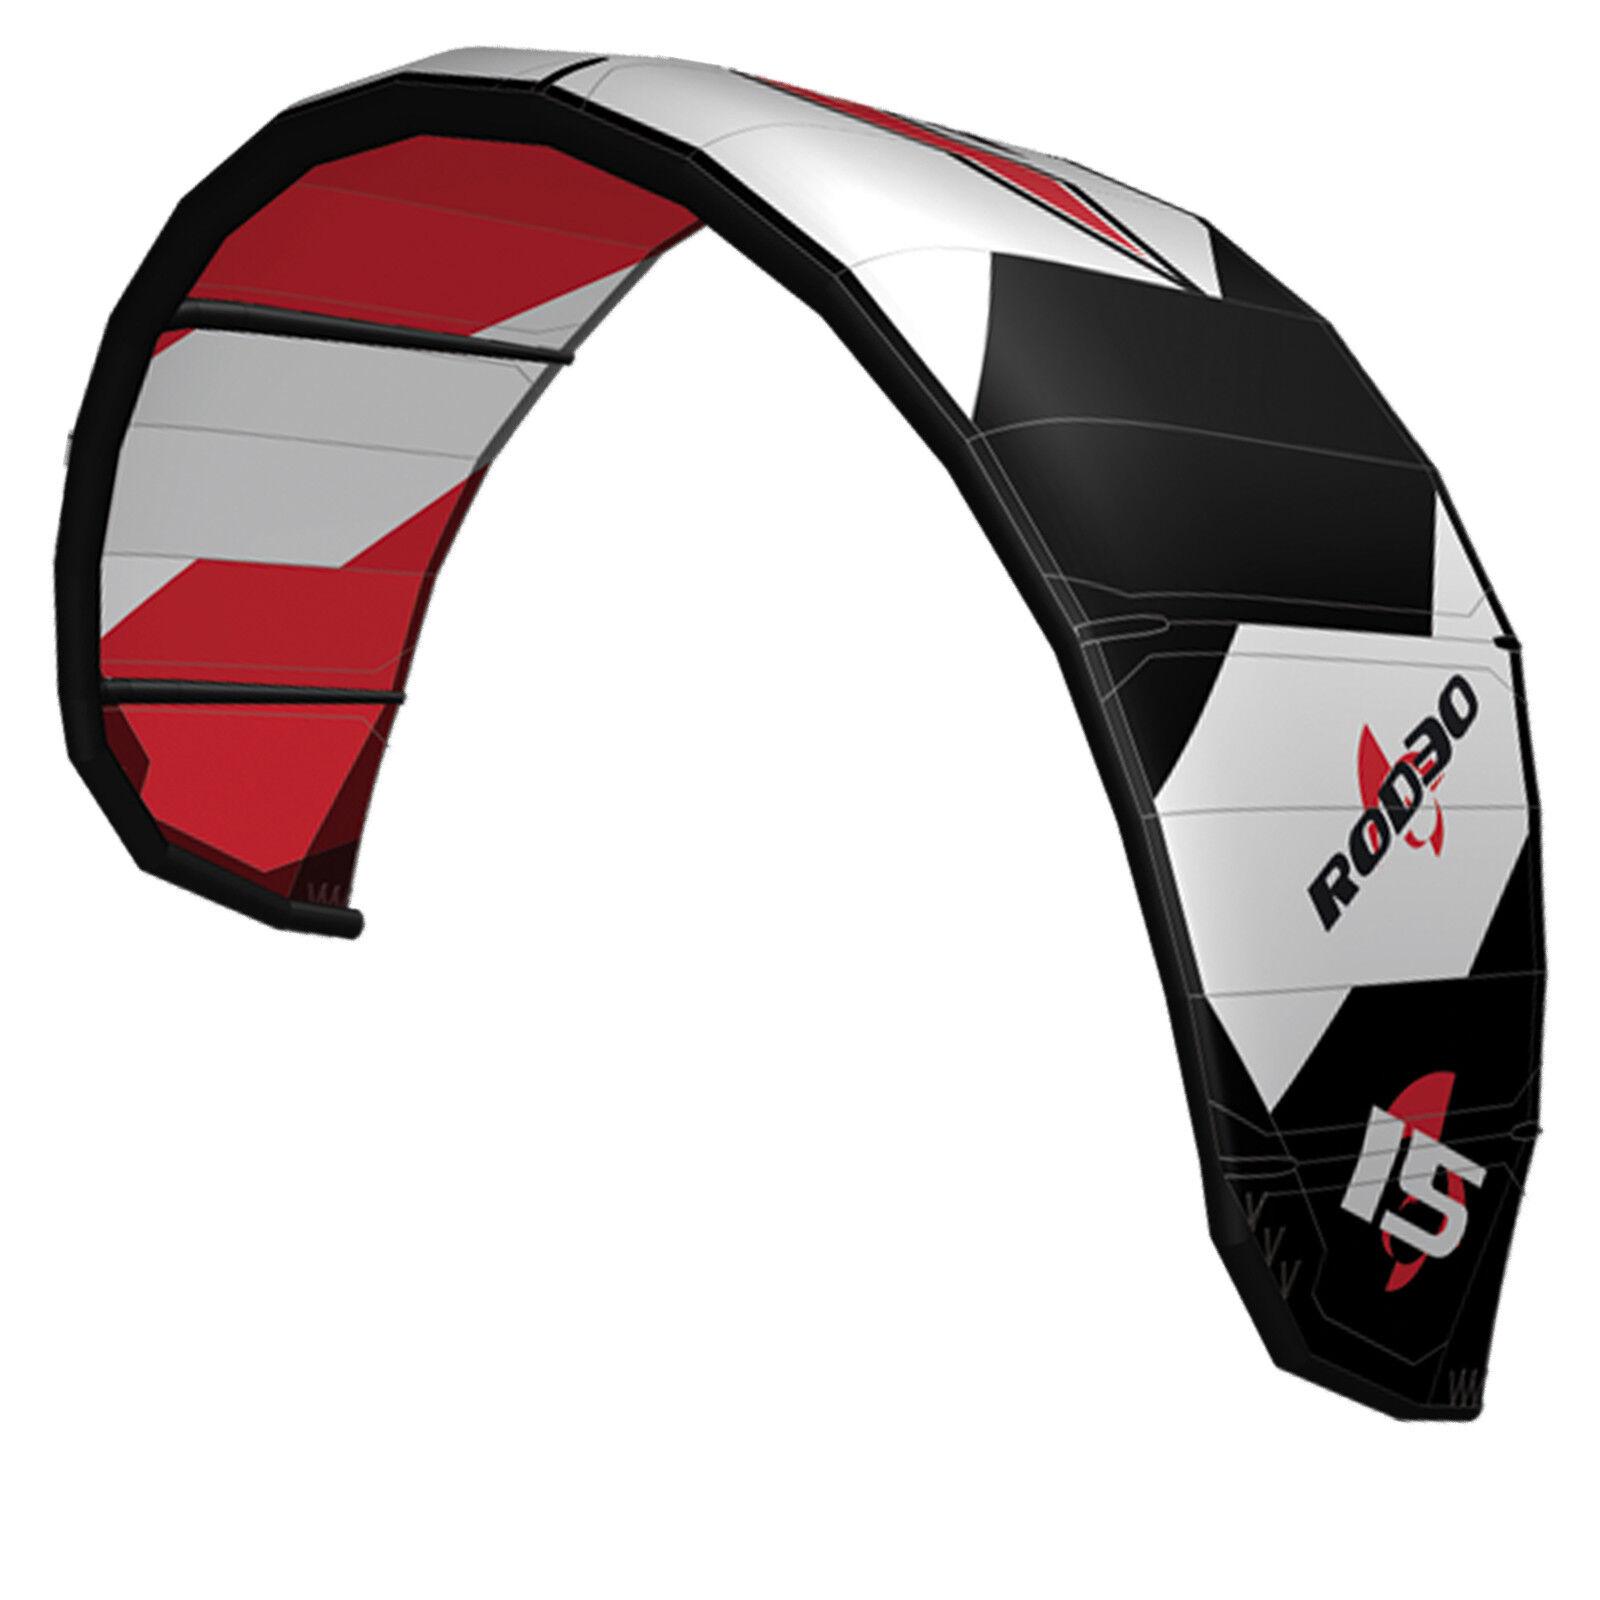 F2 Rodeo Kite  9 M ²  New School Wave Freestyle C-Kite